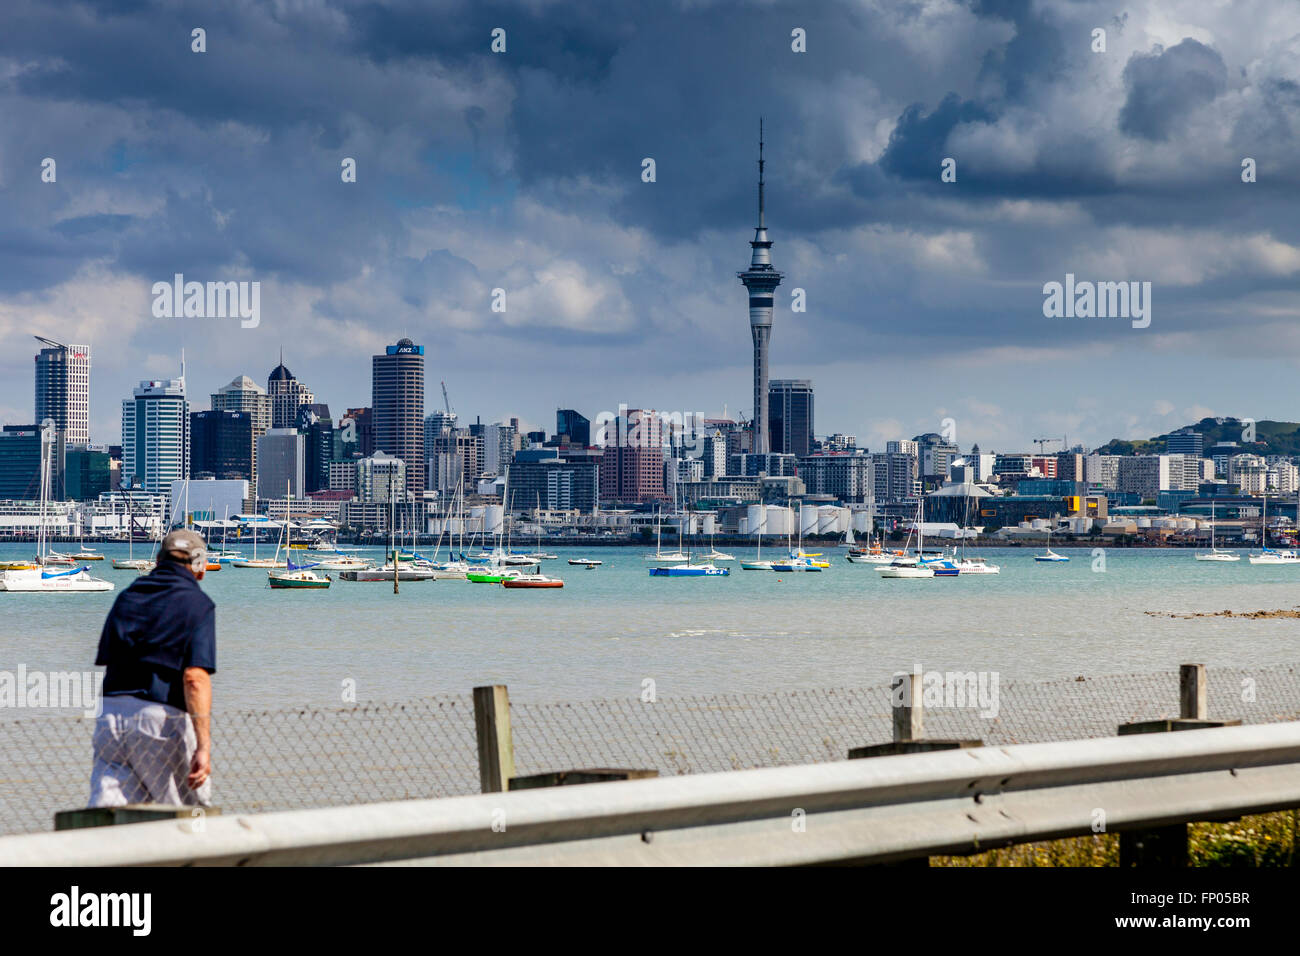 An Elderly Man Walking Towards The Auckland Harbour Bridge, Auckland, North Island, New Zealand - Stock Image